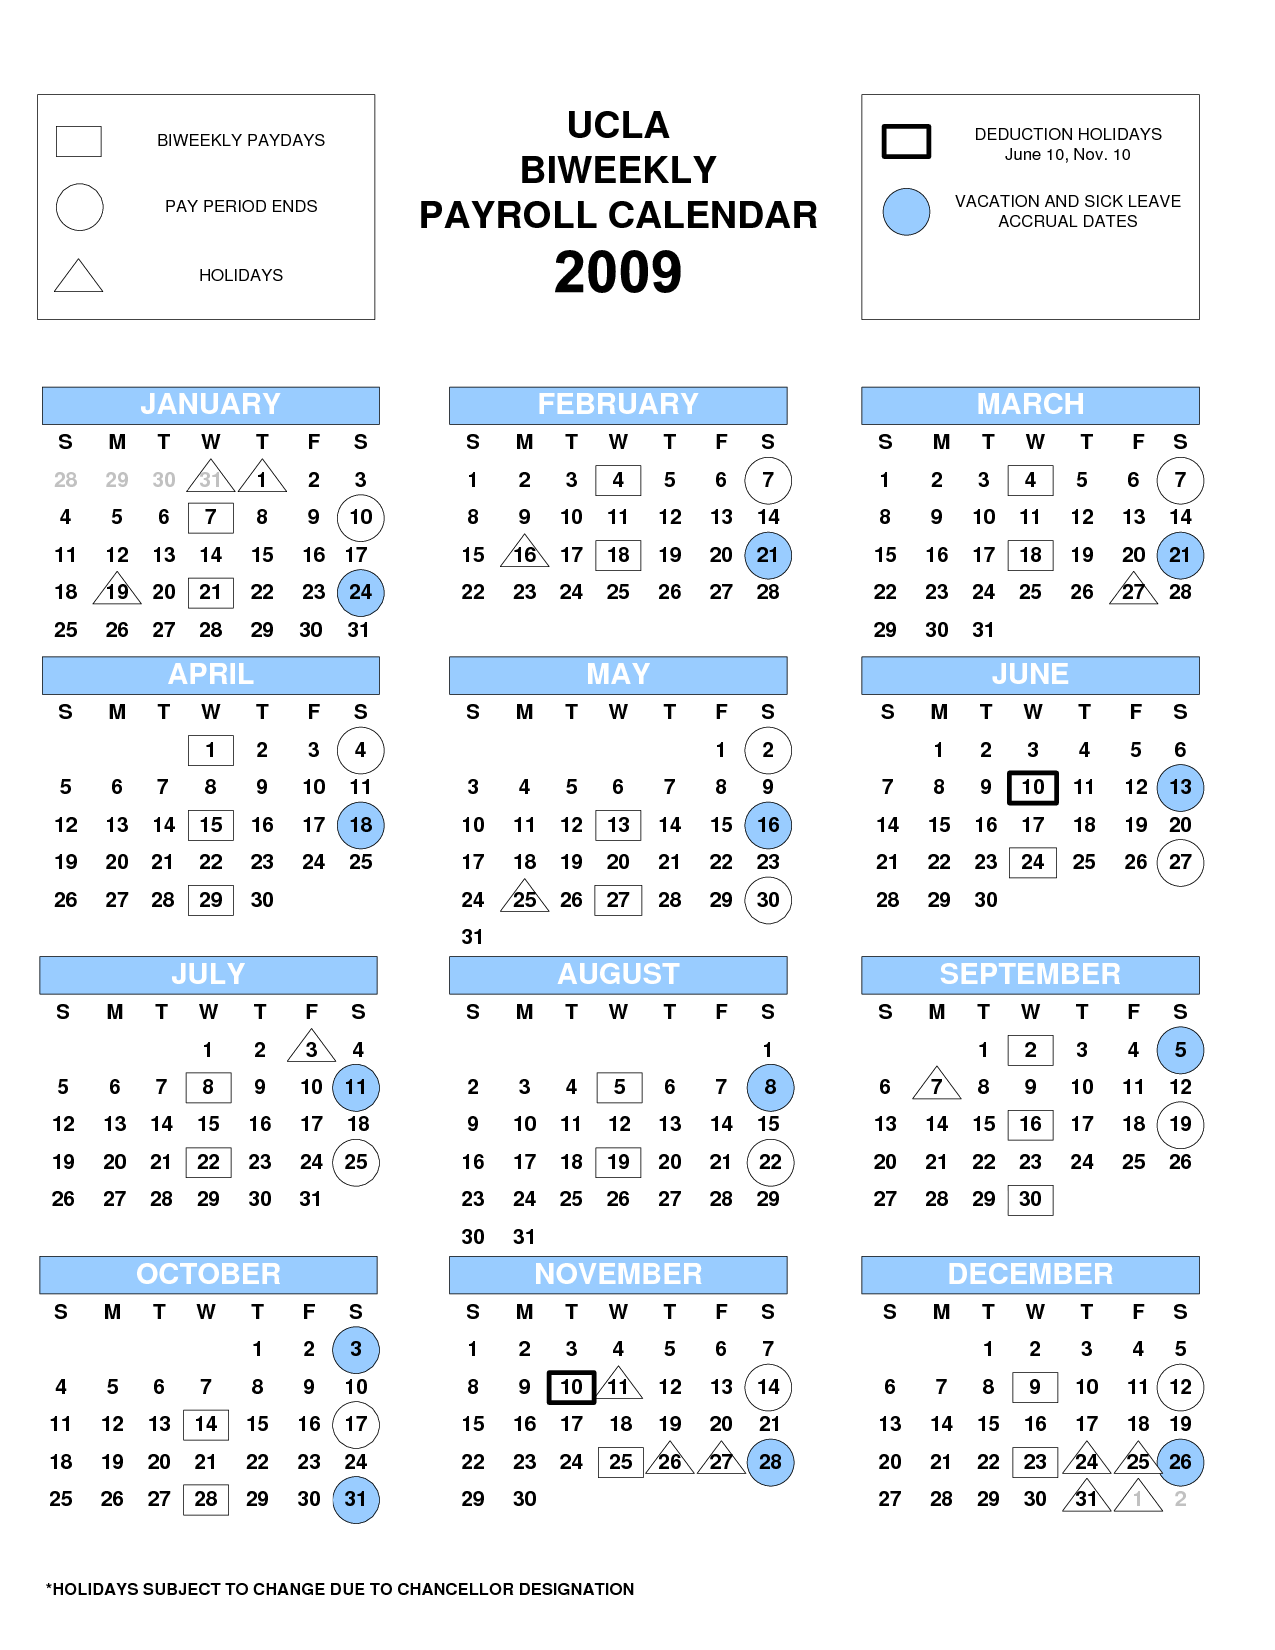 Payroll Calendar Template : UCLA Bi Weekly Payroll Calendar 2015